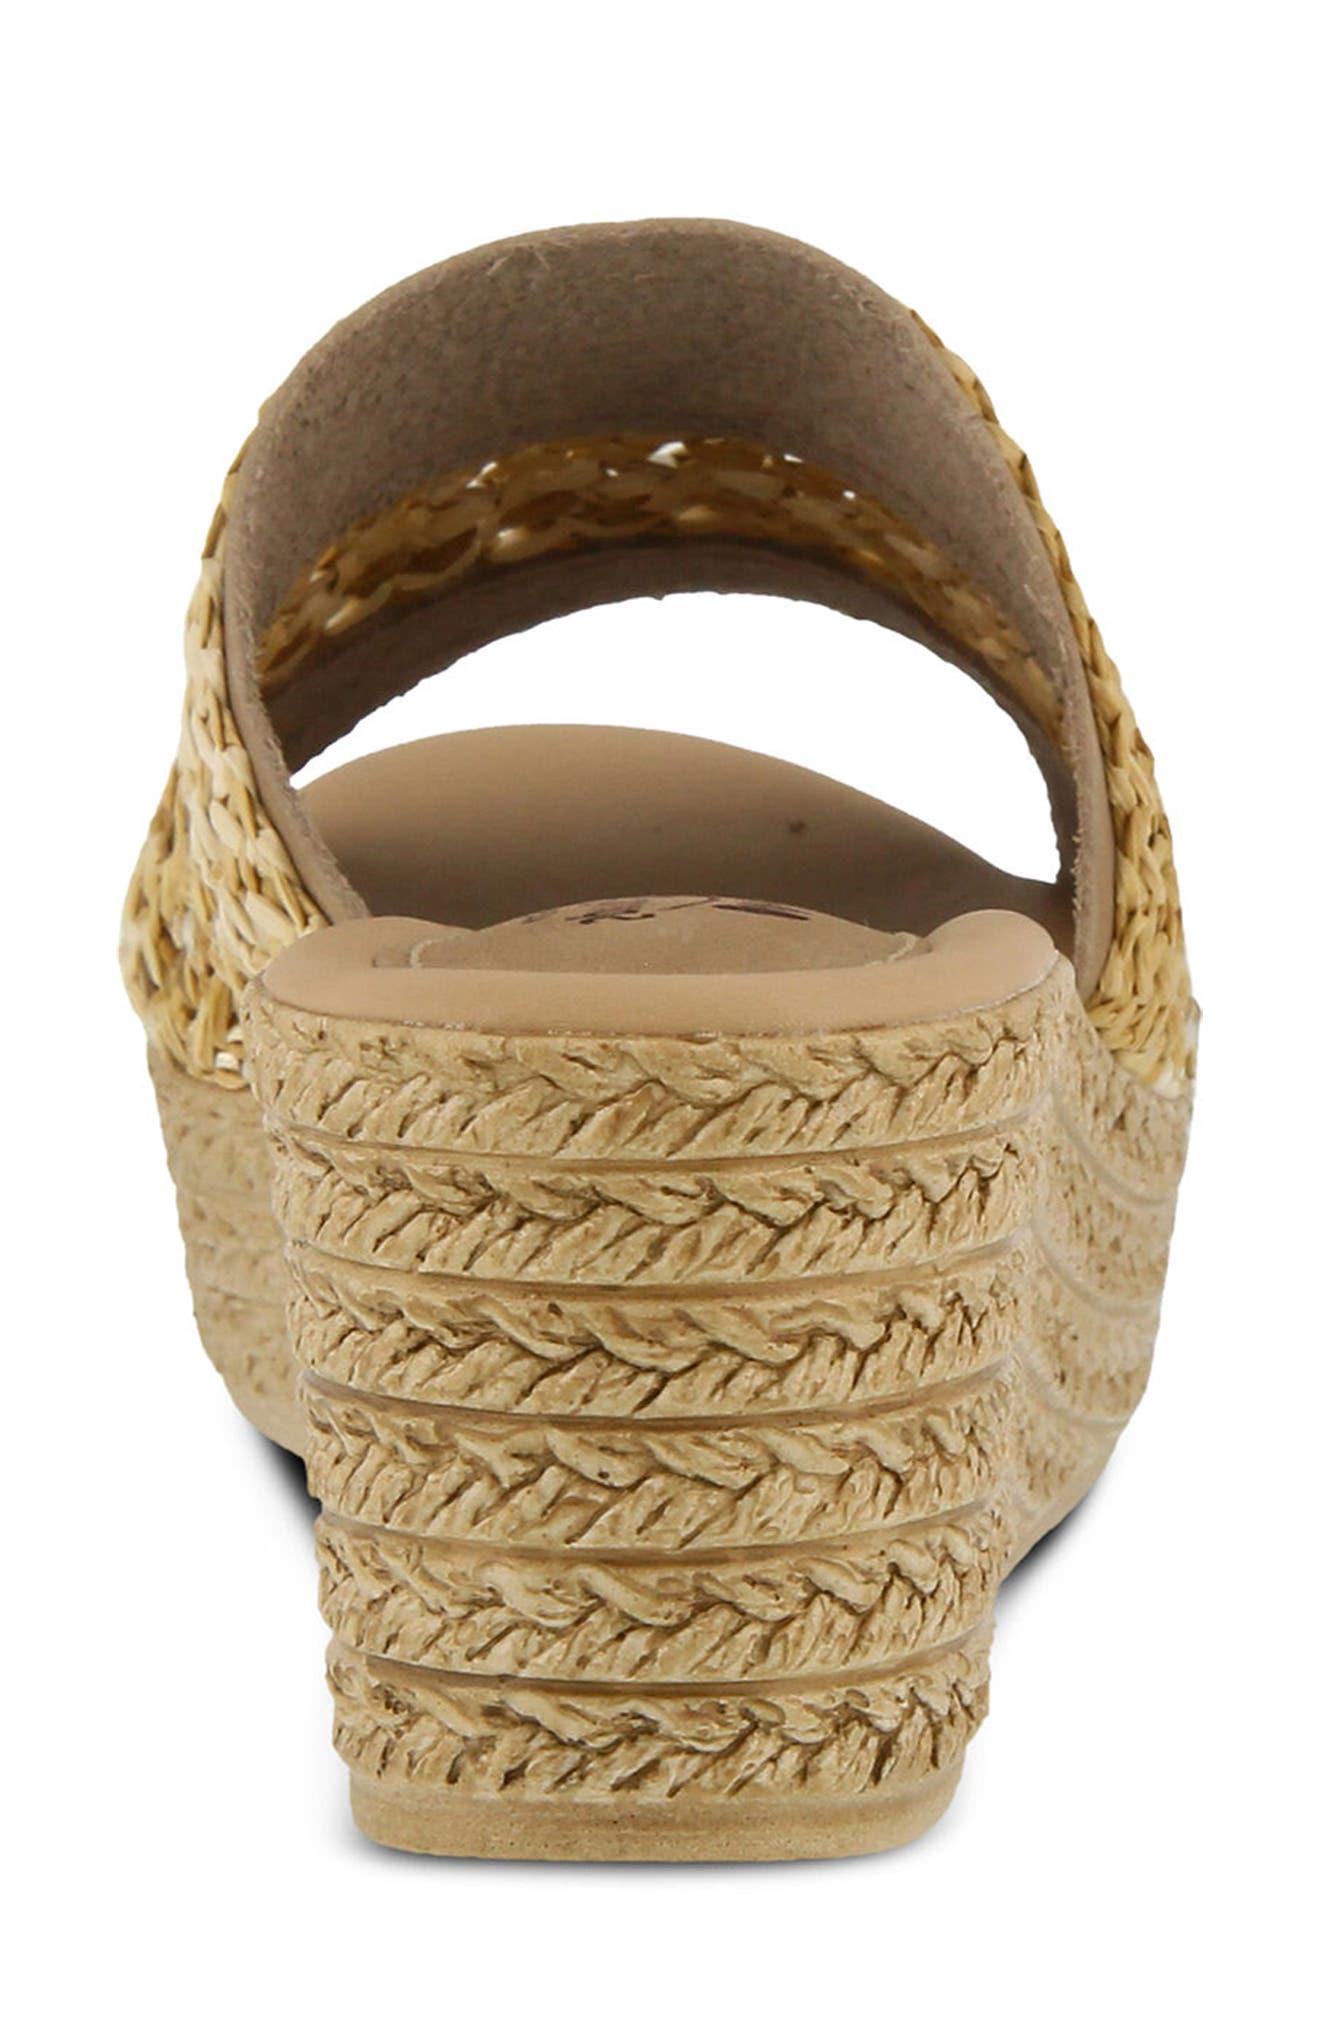 Calci Espadrille Wedge Sandal,                             Alternate thumbnail 17, color,